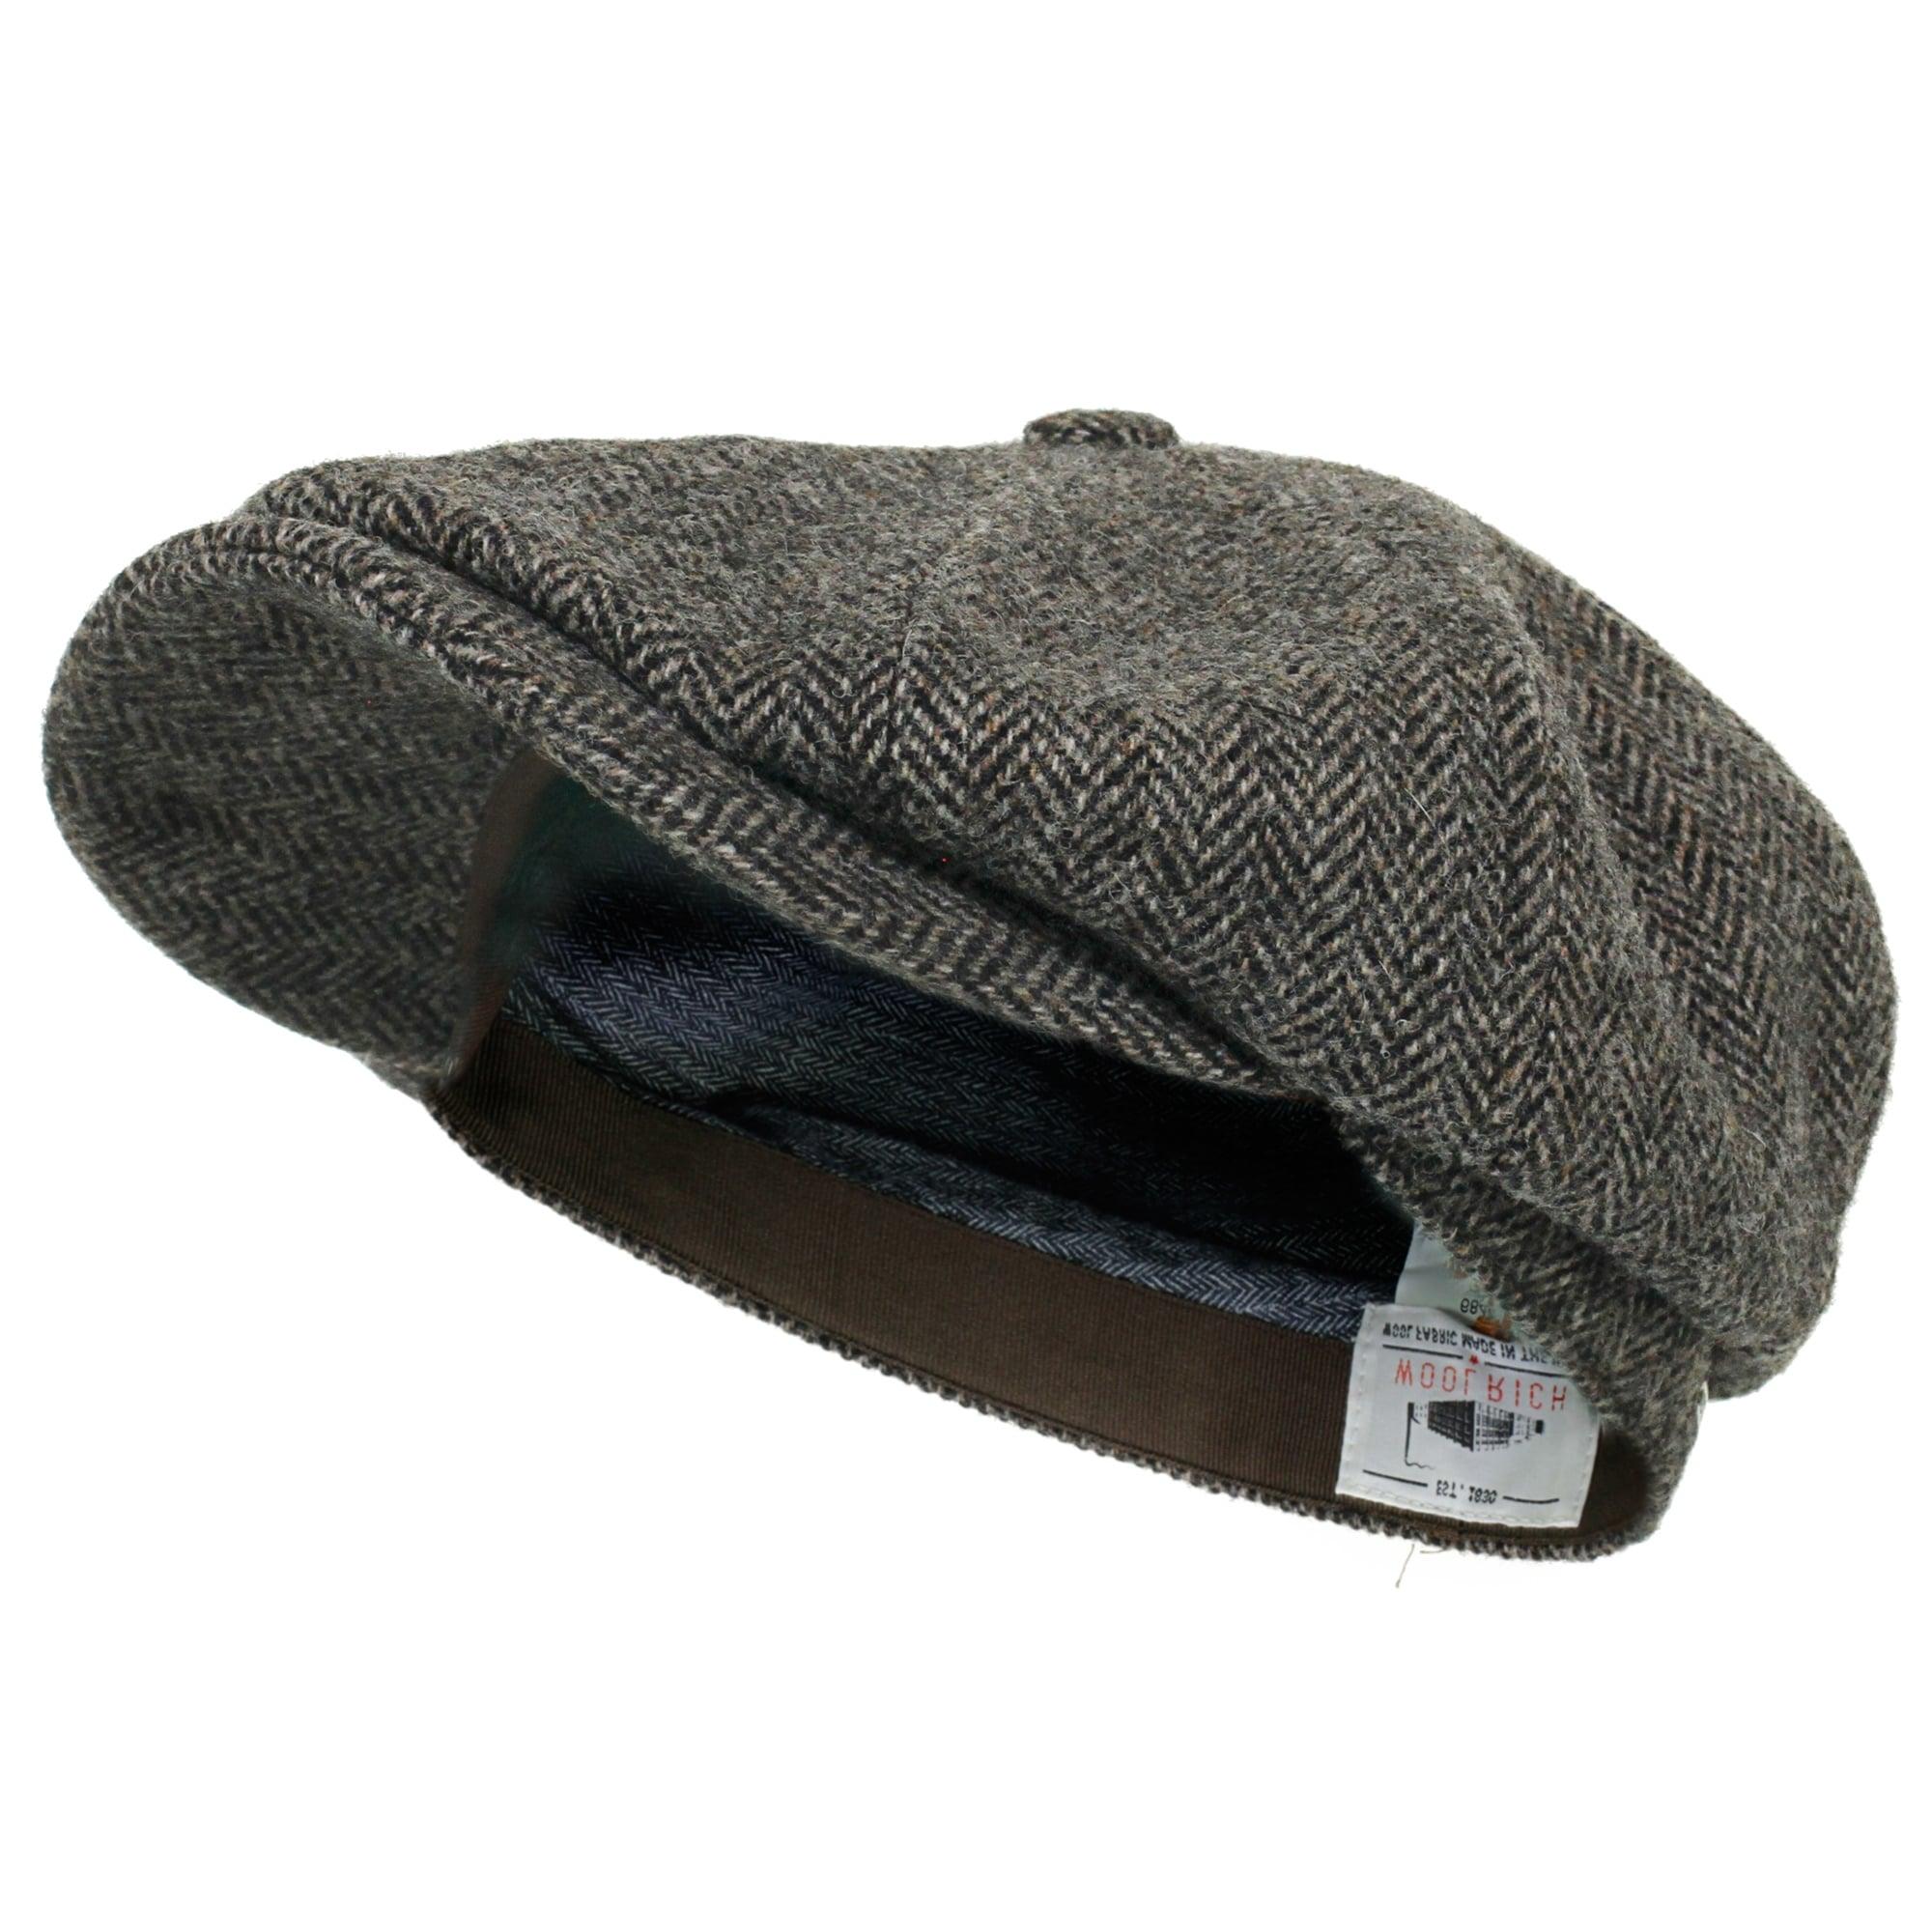 b0c7267a4 Stetson Headwear Stetson Hatteras Woolrich Herringbone Grey Newsboy Hat  6840514 333